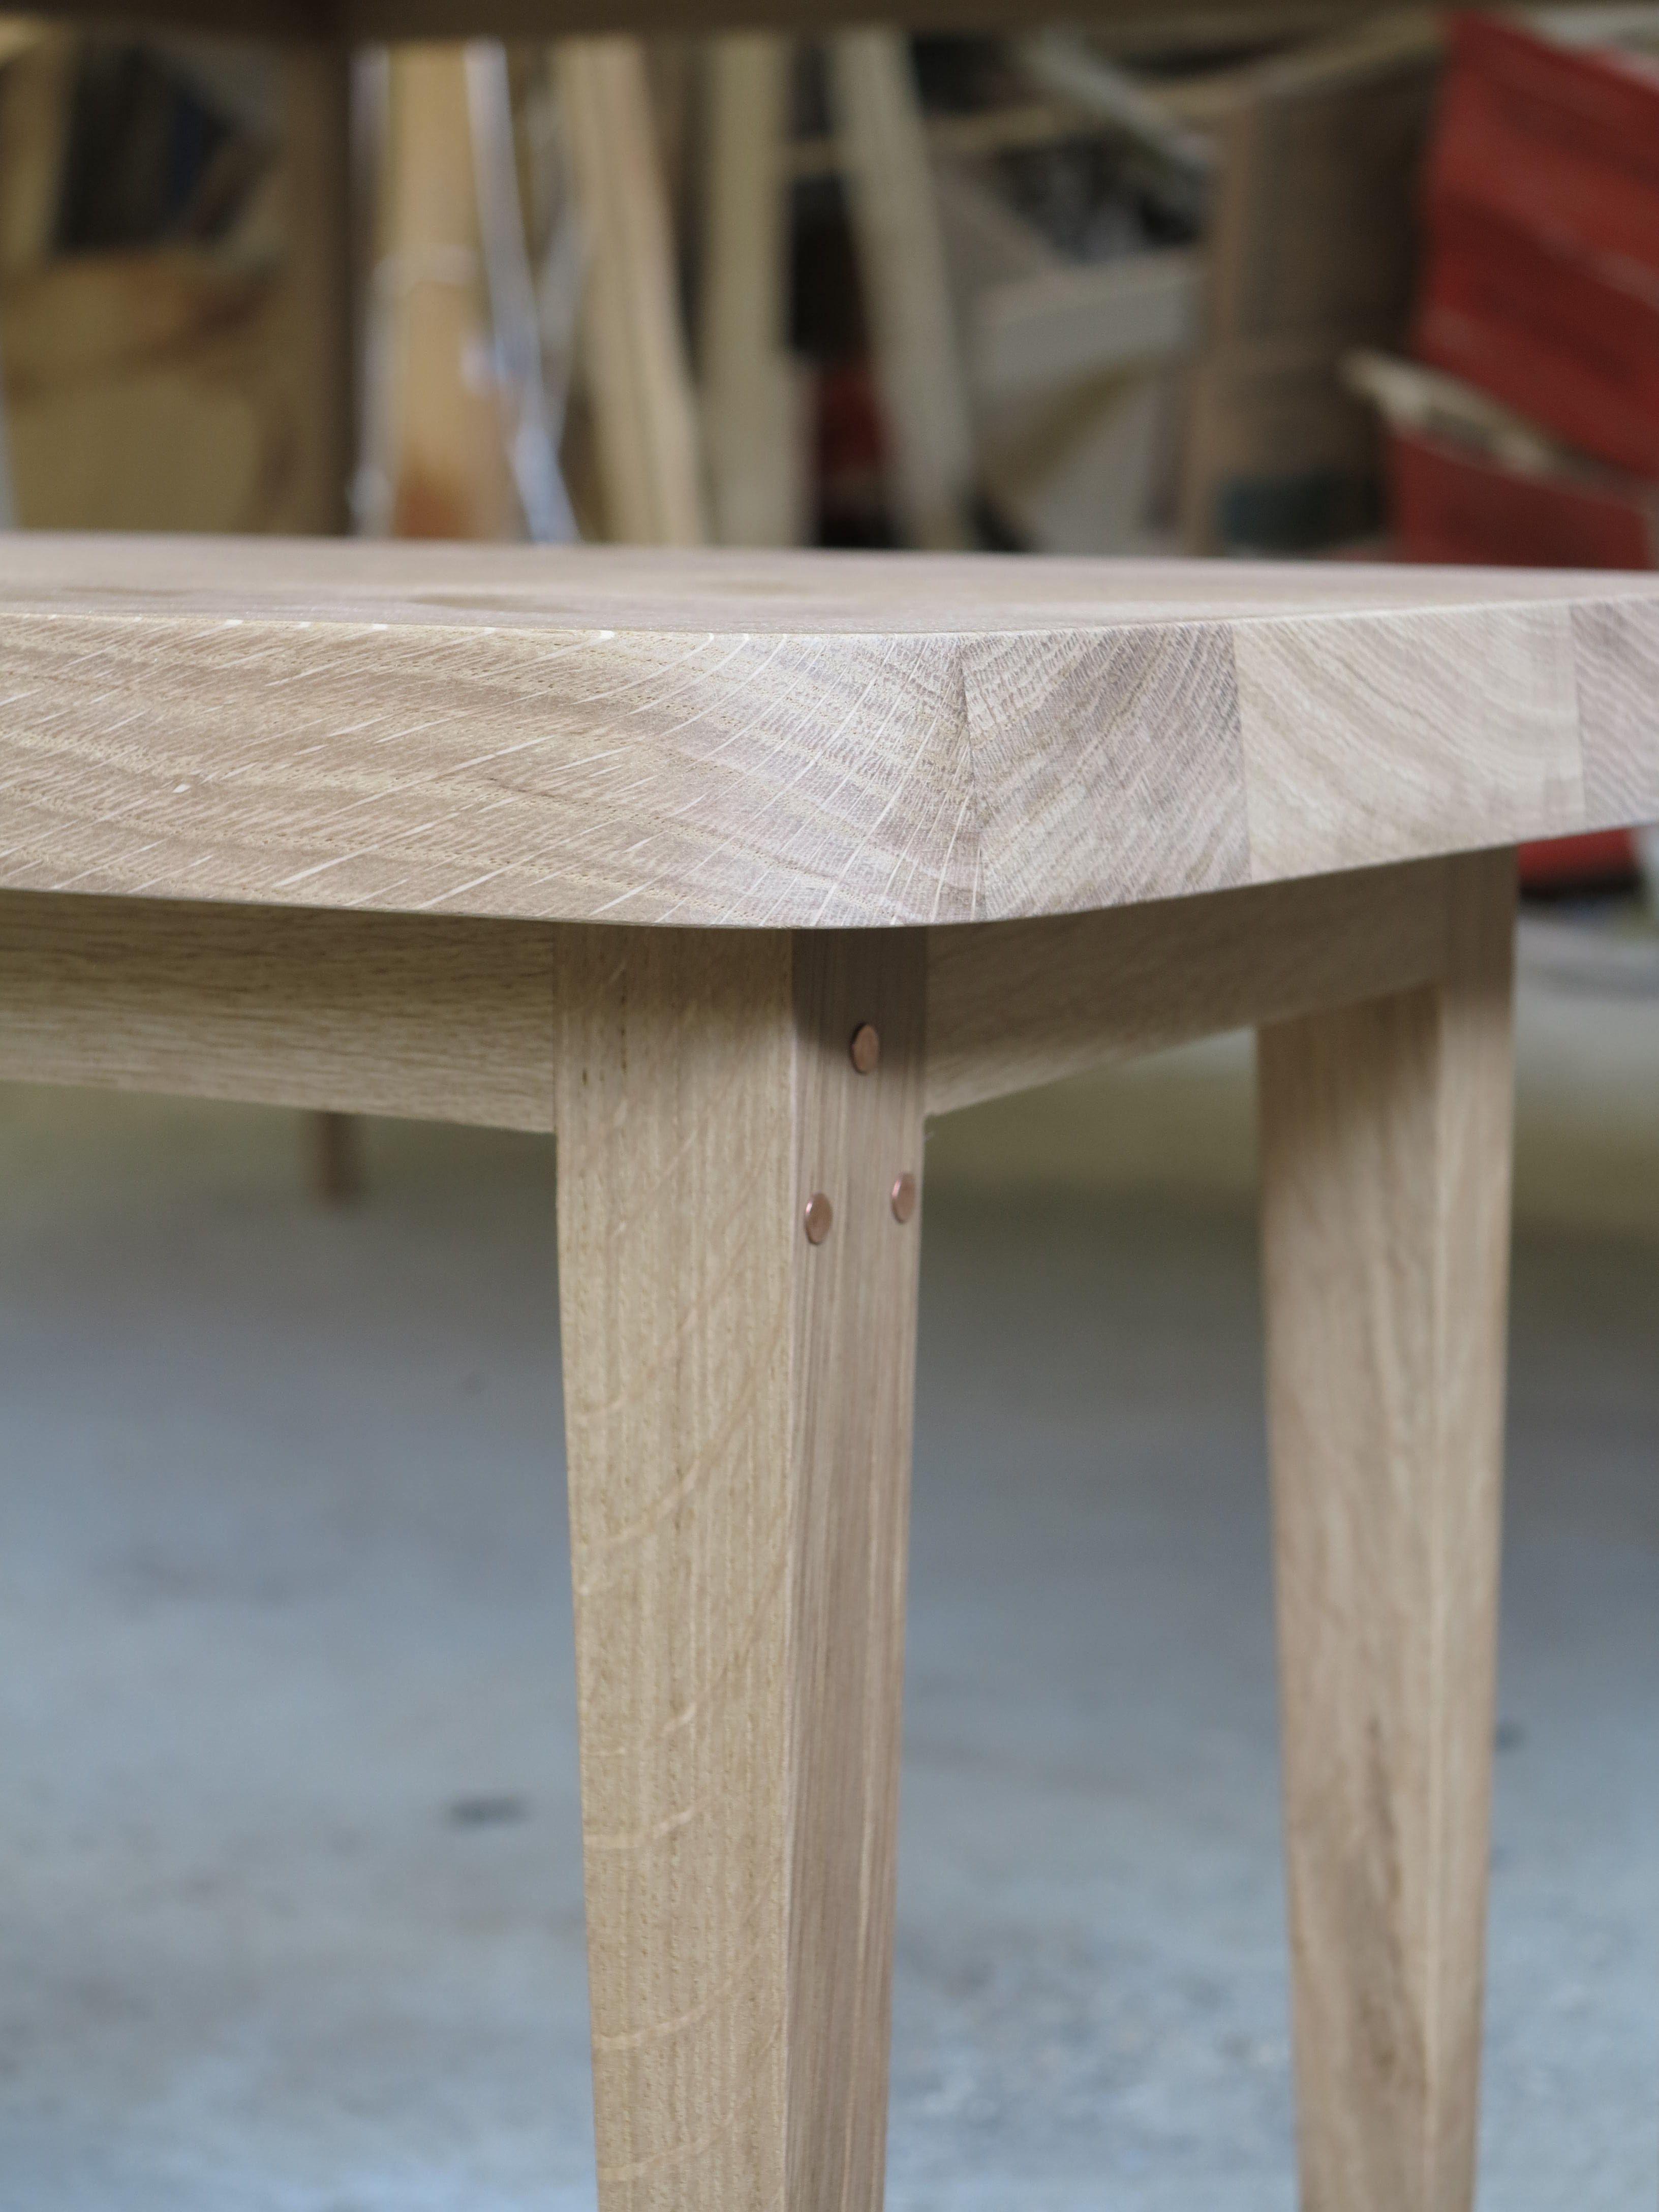 Design Fran§ois Rabot tables rallonge banc chªne massif